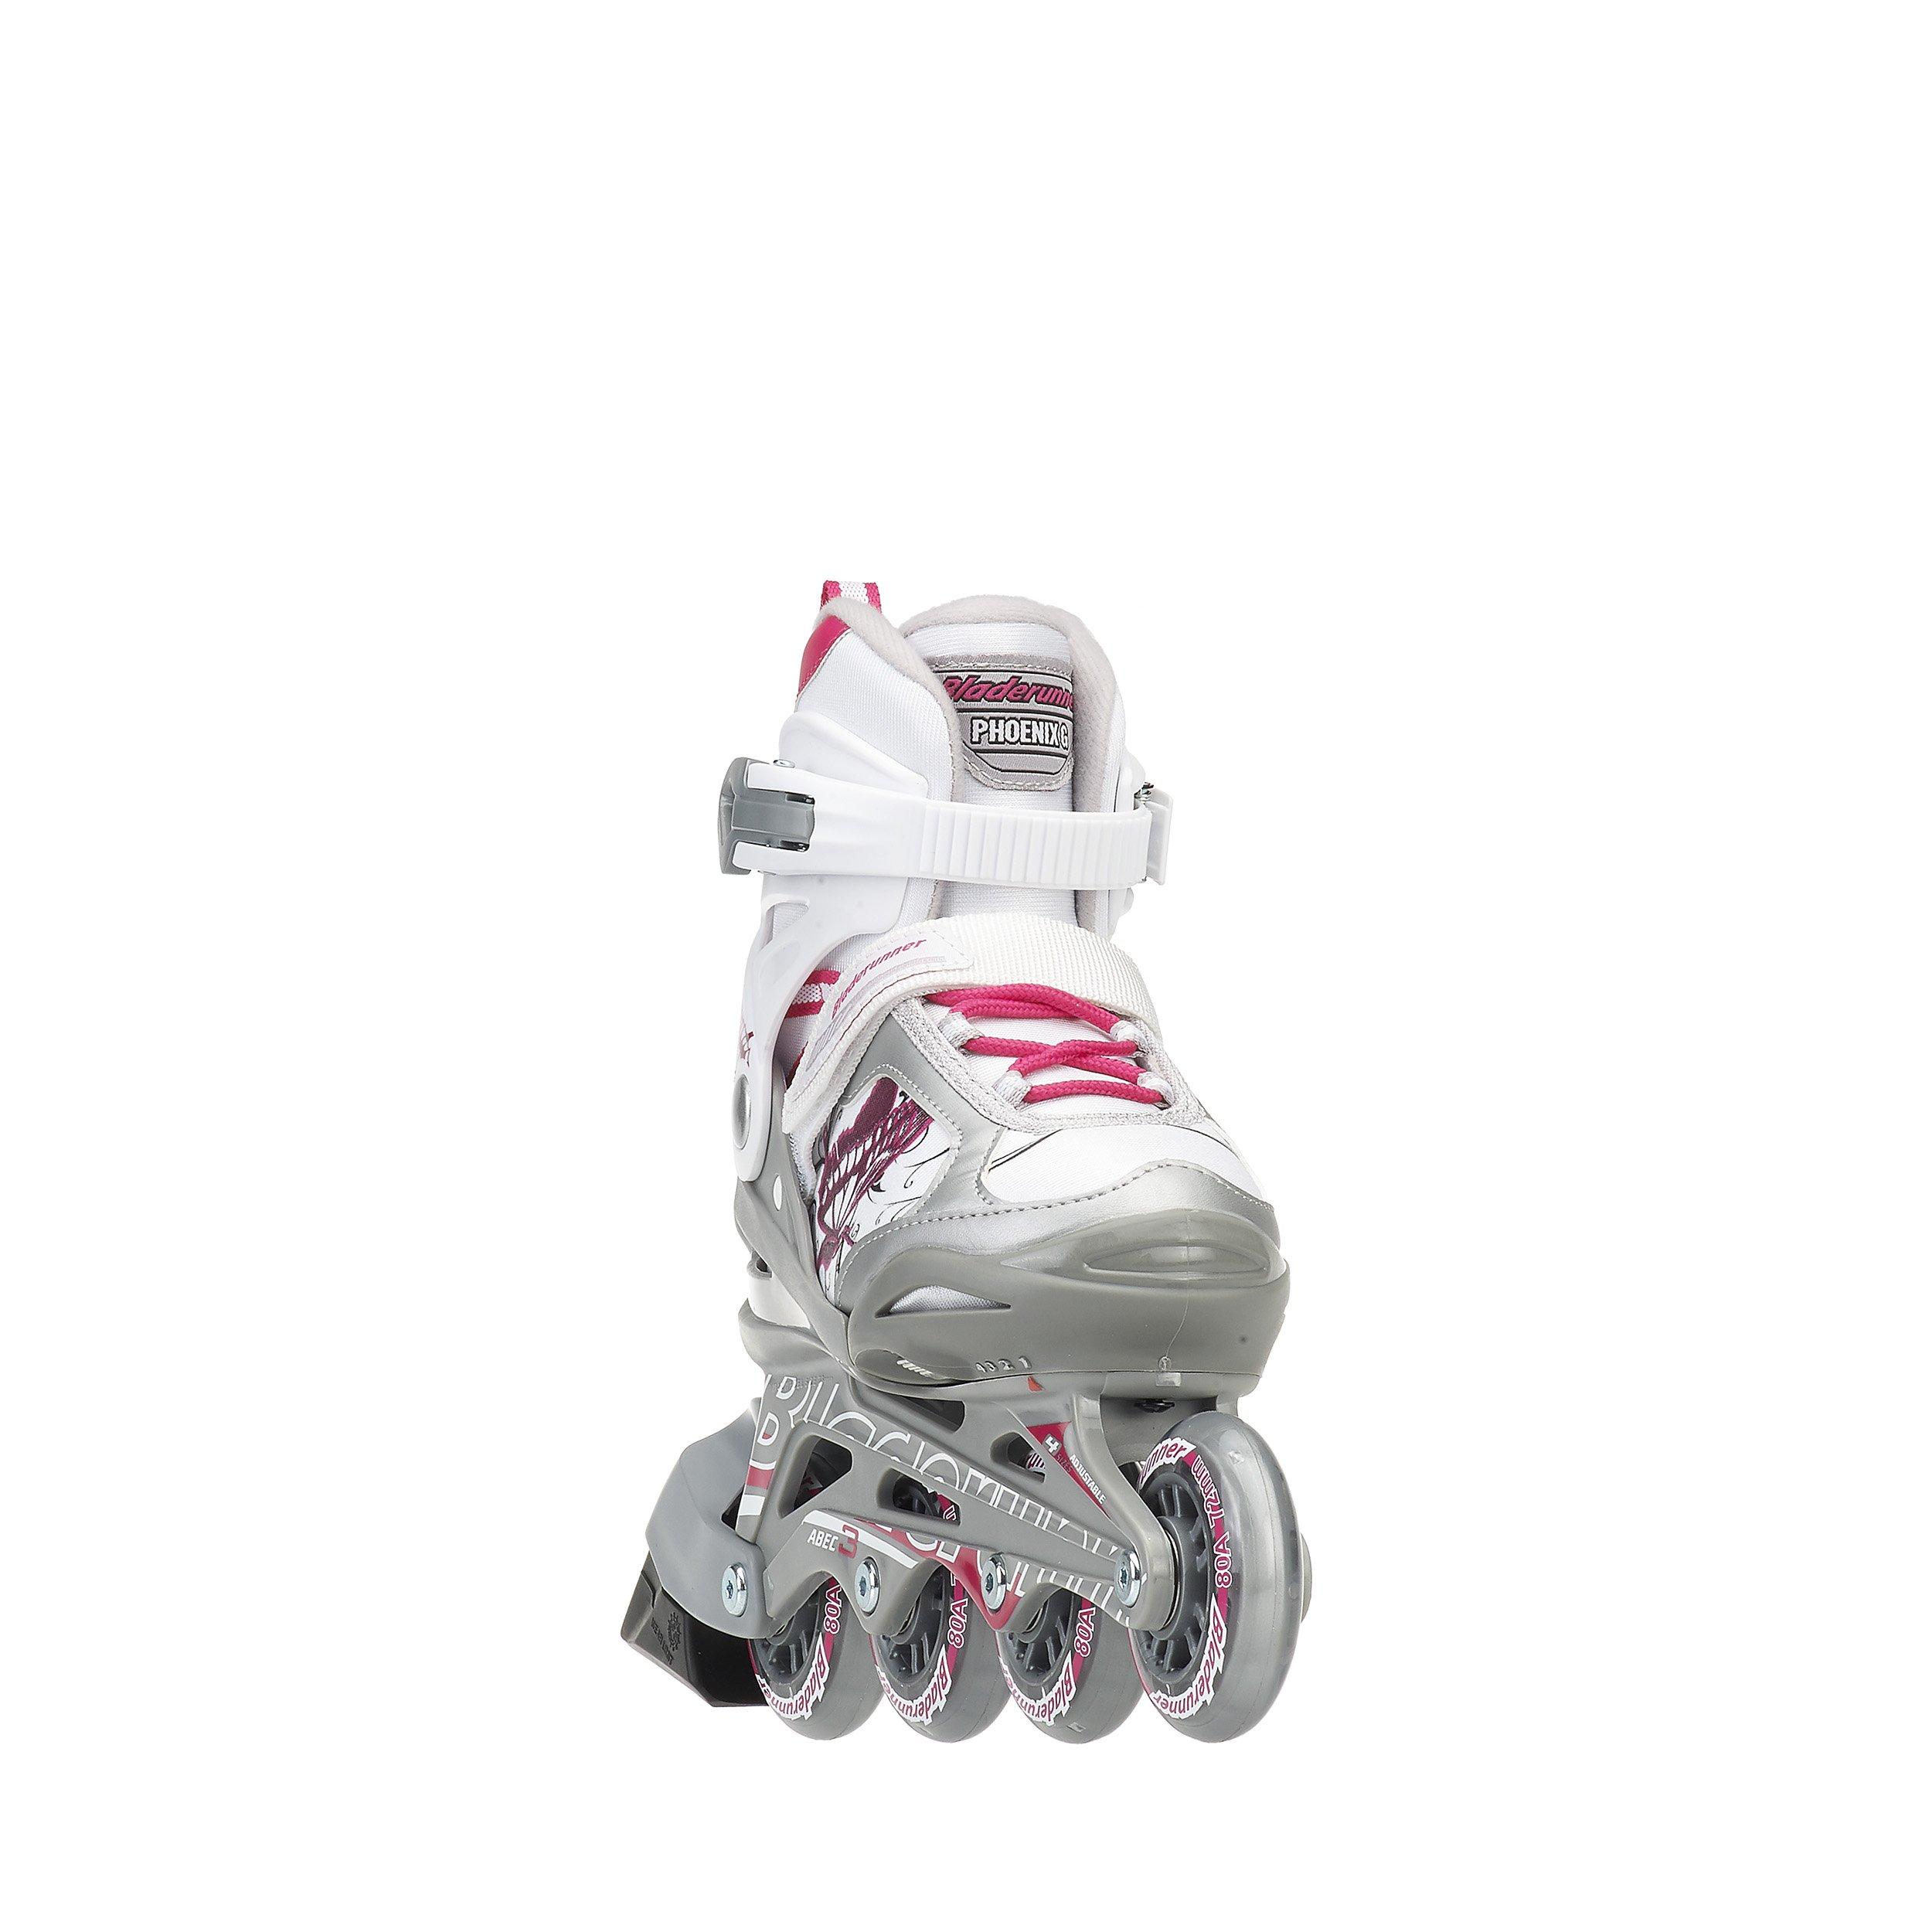 Rollerblade Bladerunner Phoenix Girls Adjustable Fitness Inline Skate, White and Pink, Junior, Value Performance Inline Skates, Youth Junior 1 to 4 by Rollerblade (Image #3)